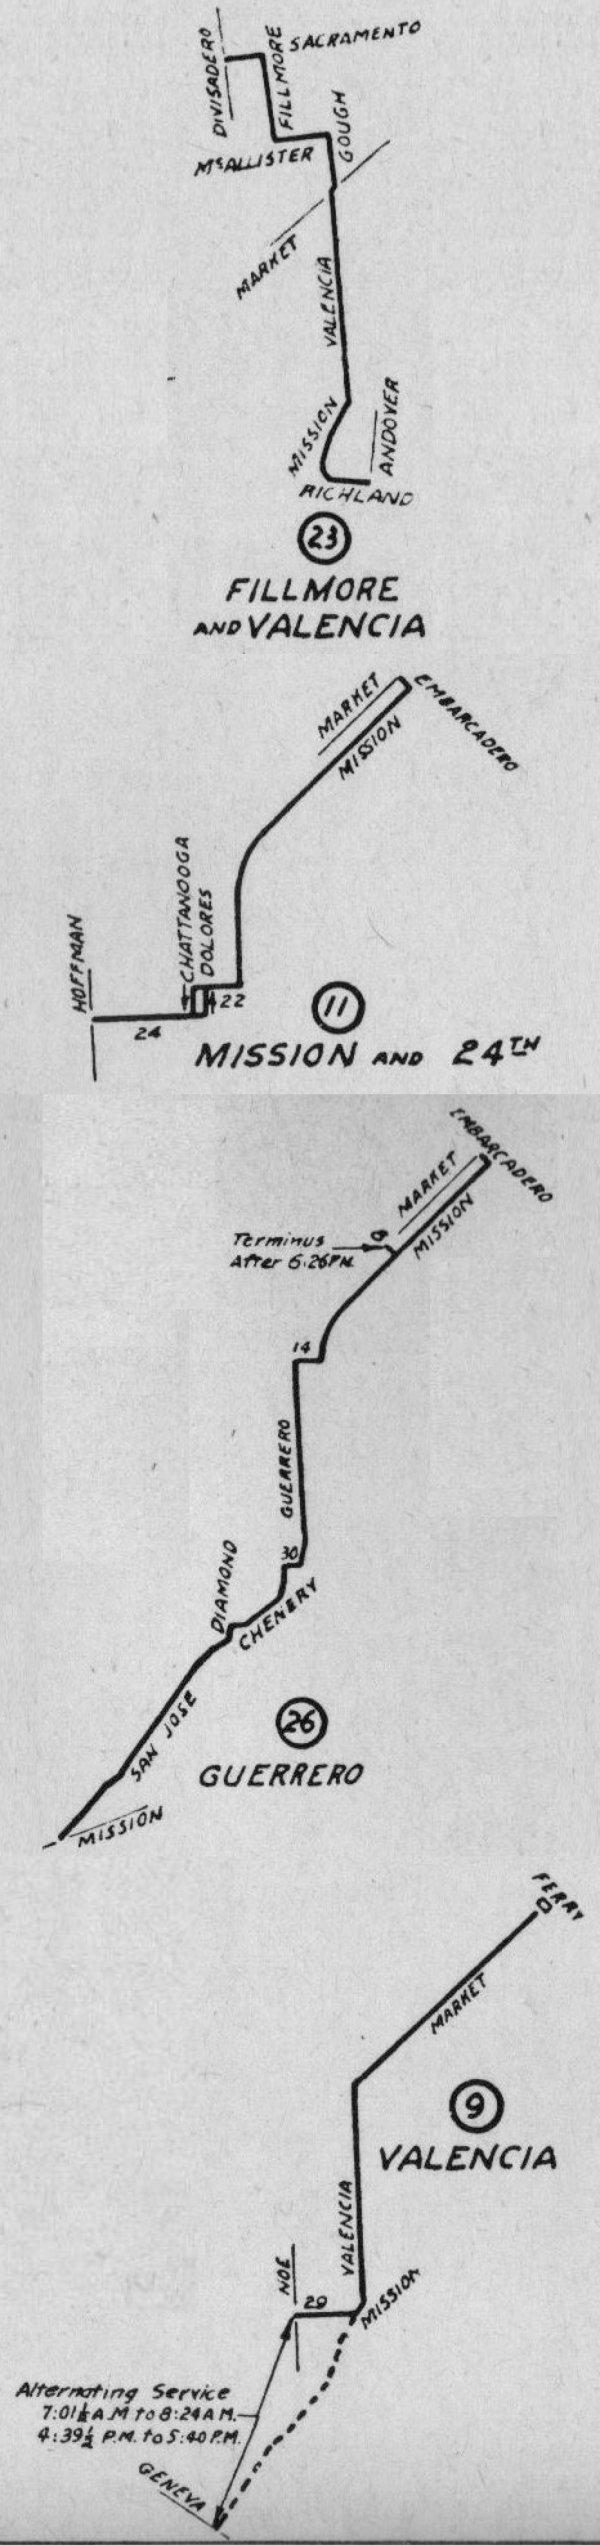 1929 streetcar lines 23 11 26 9